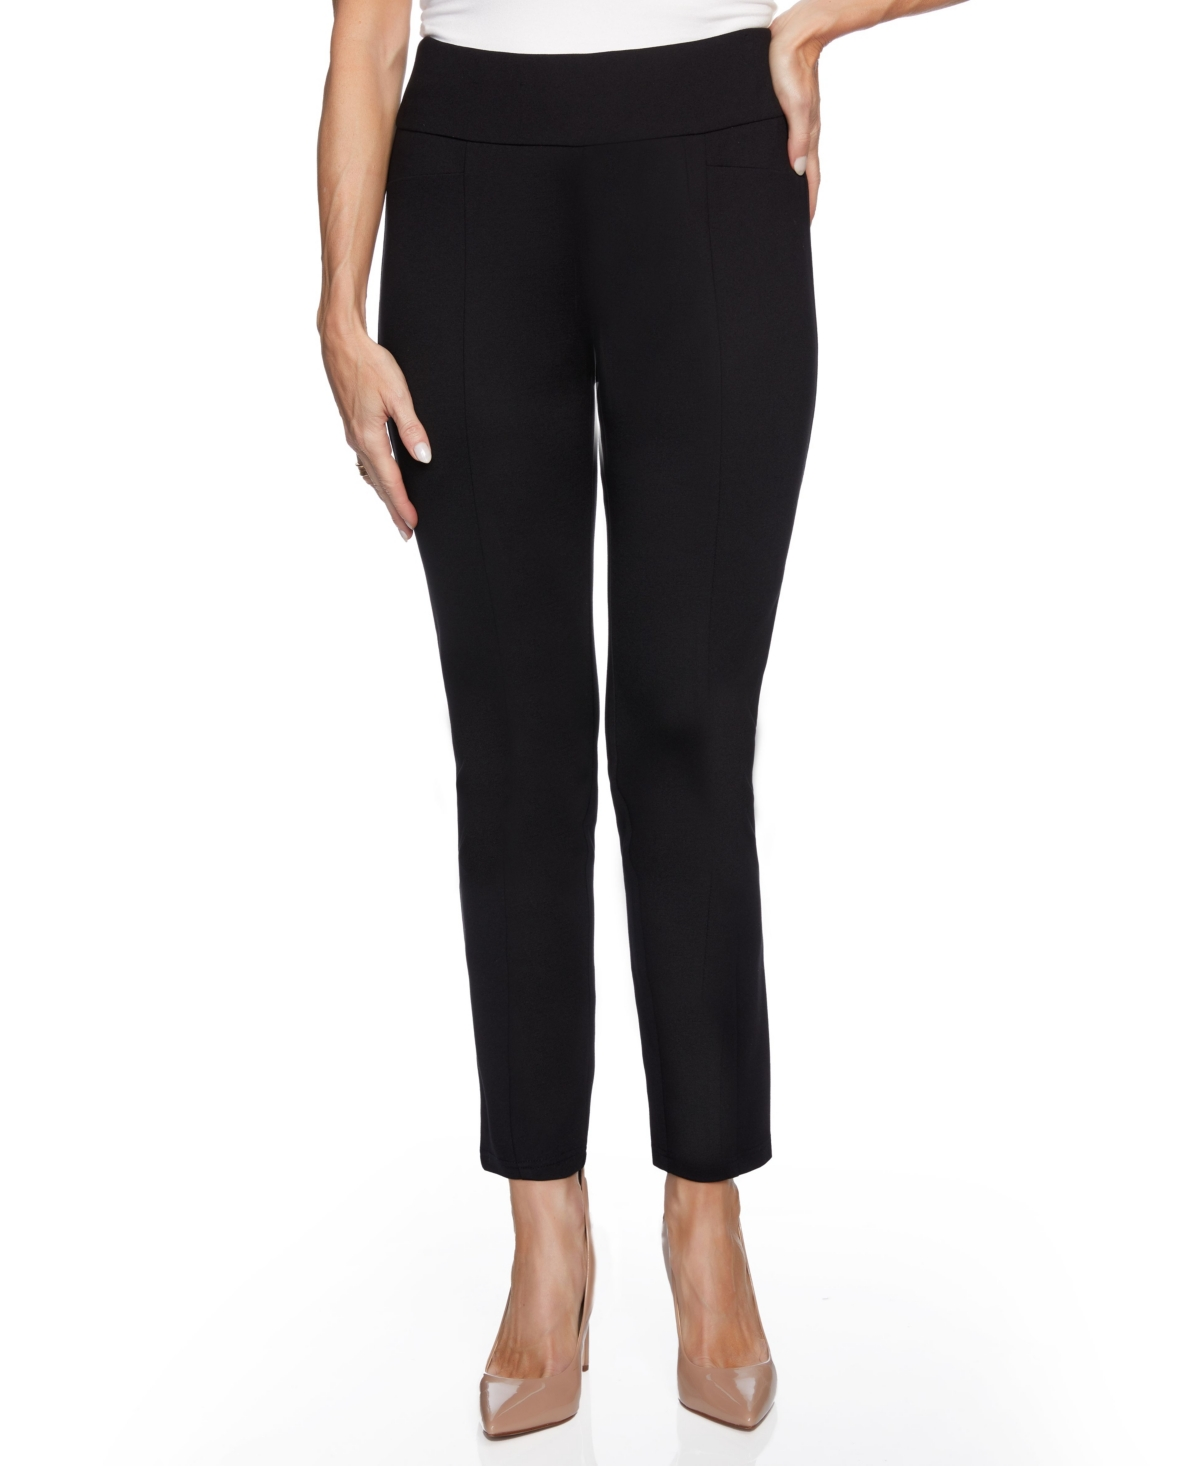 Women's High Waist Slim Ponte with Wide Waistband Pants